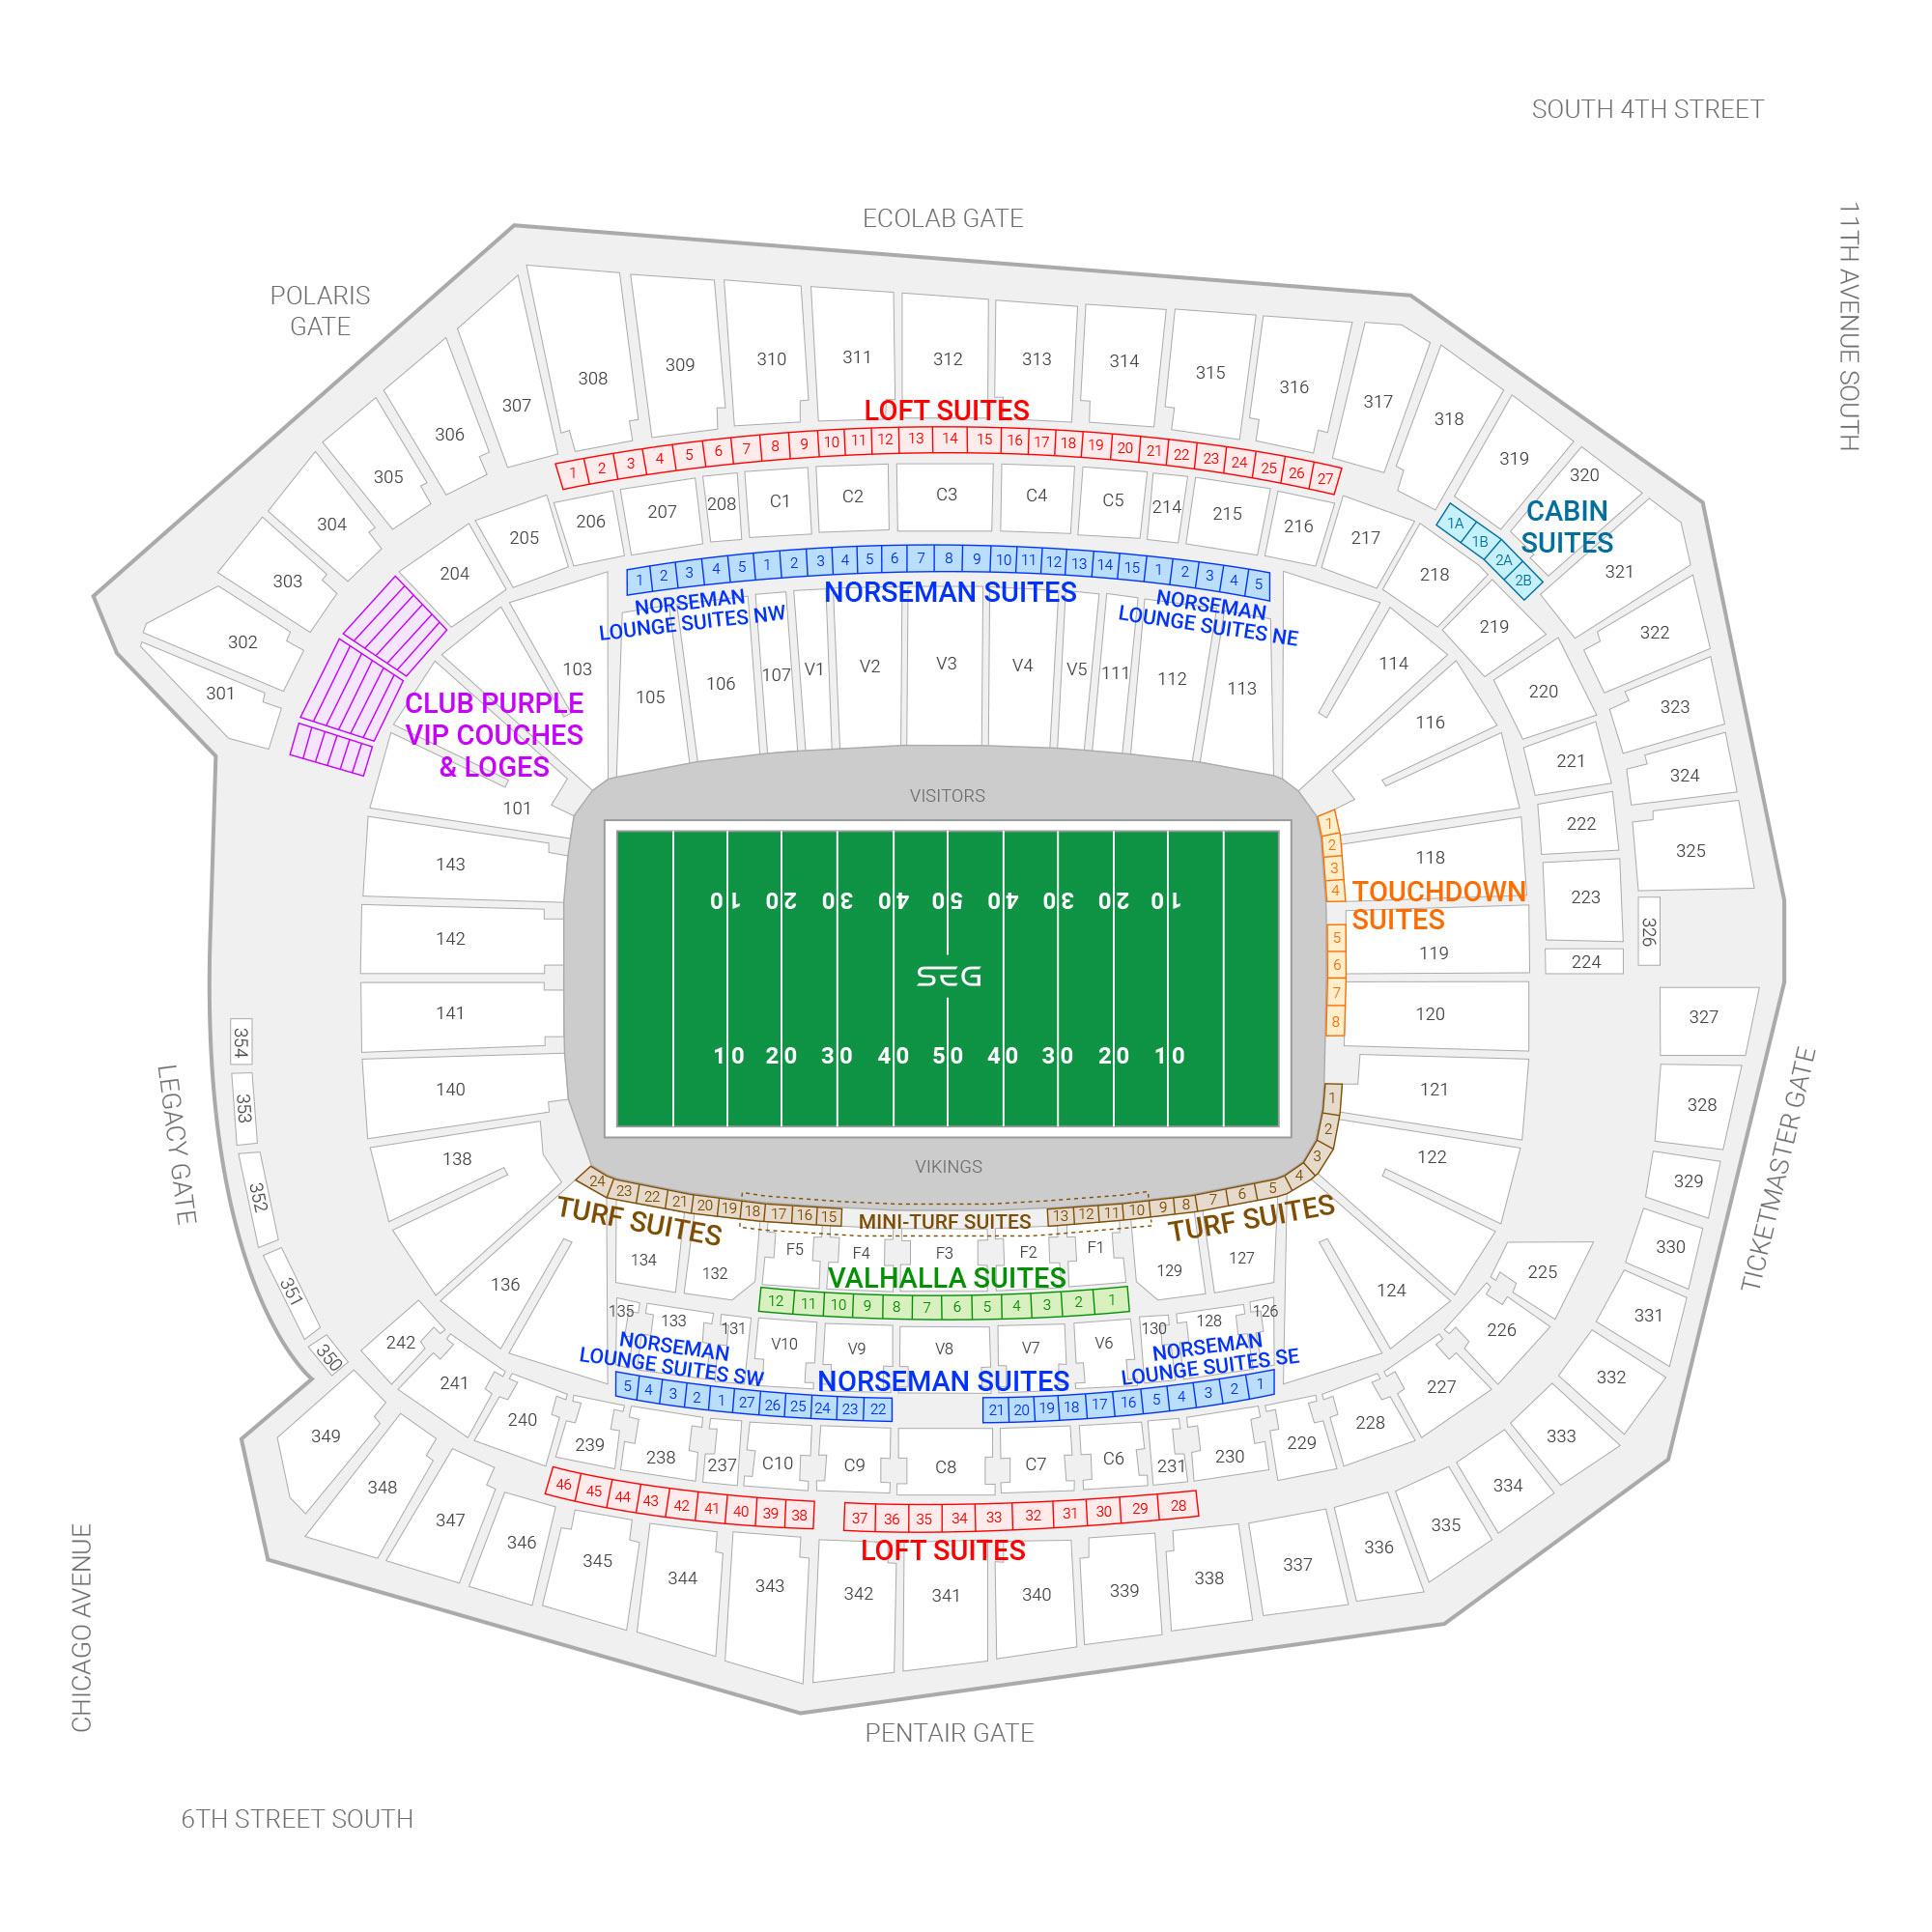 U.S. Bank Stadium / Minnesota Vikings Suite Map and Seating Chart